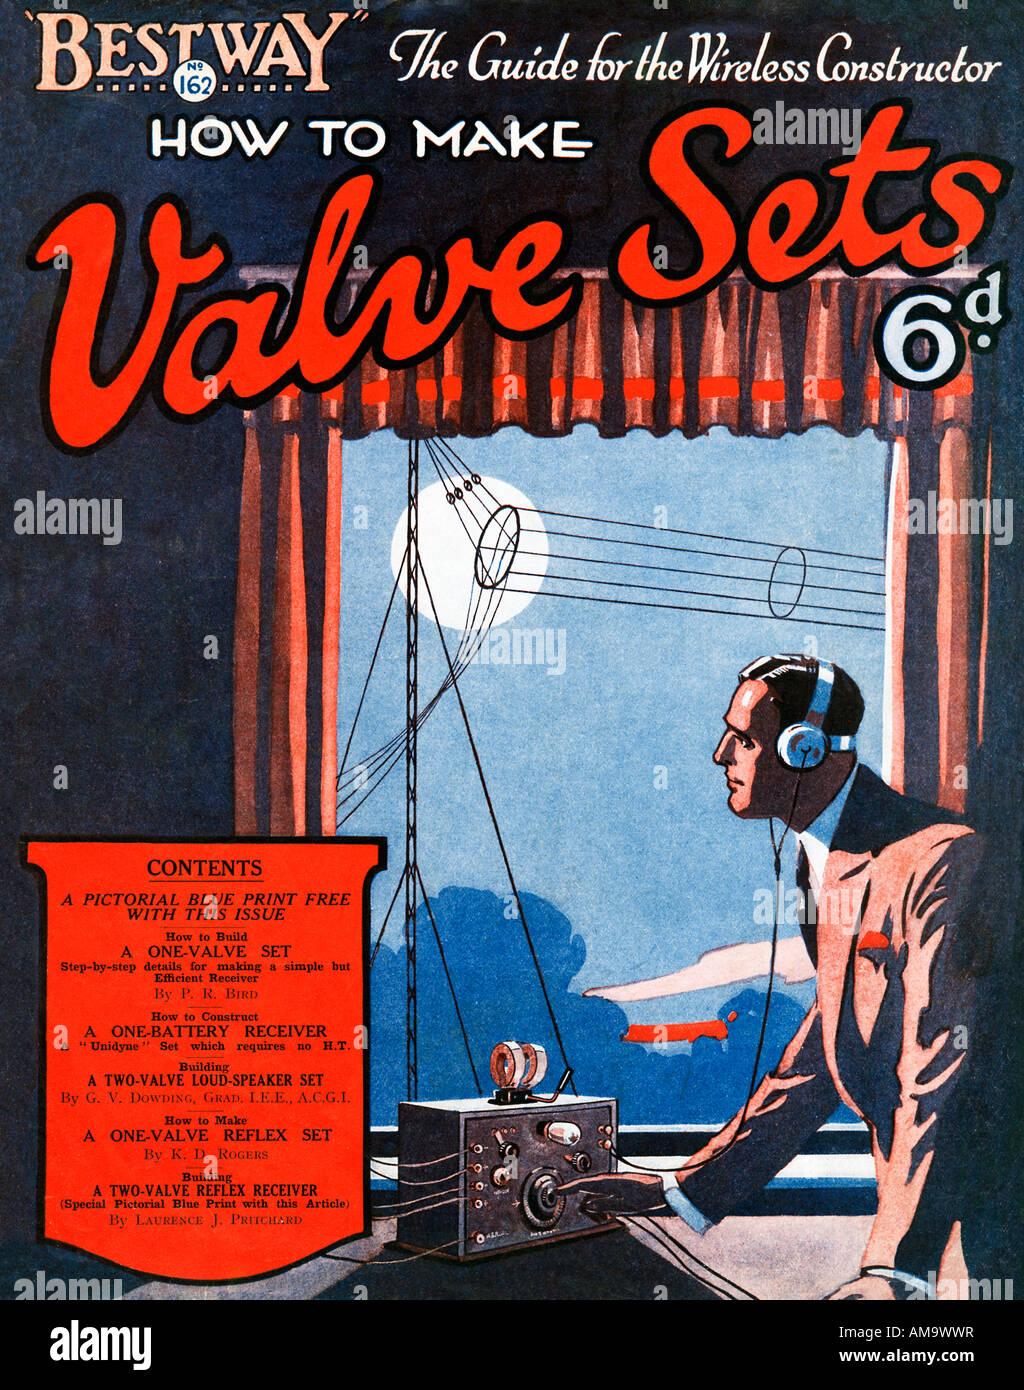 Valve Radio Stock Photos & Valve Radio Stock Images - Alamy